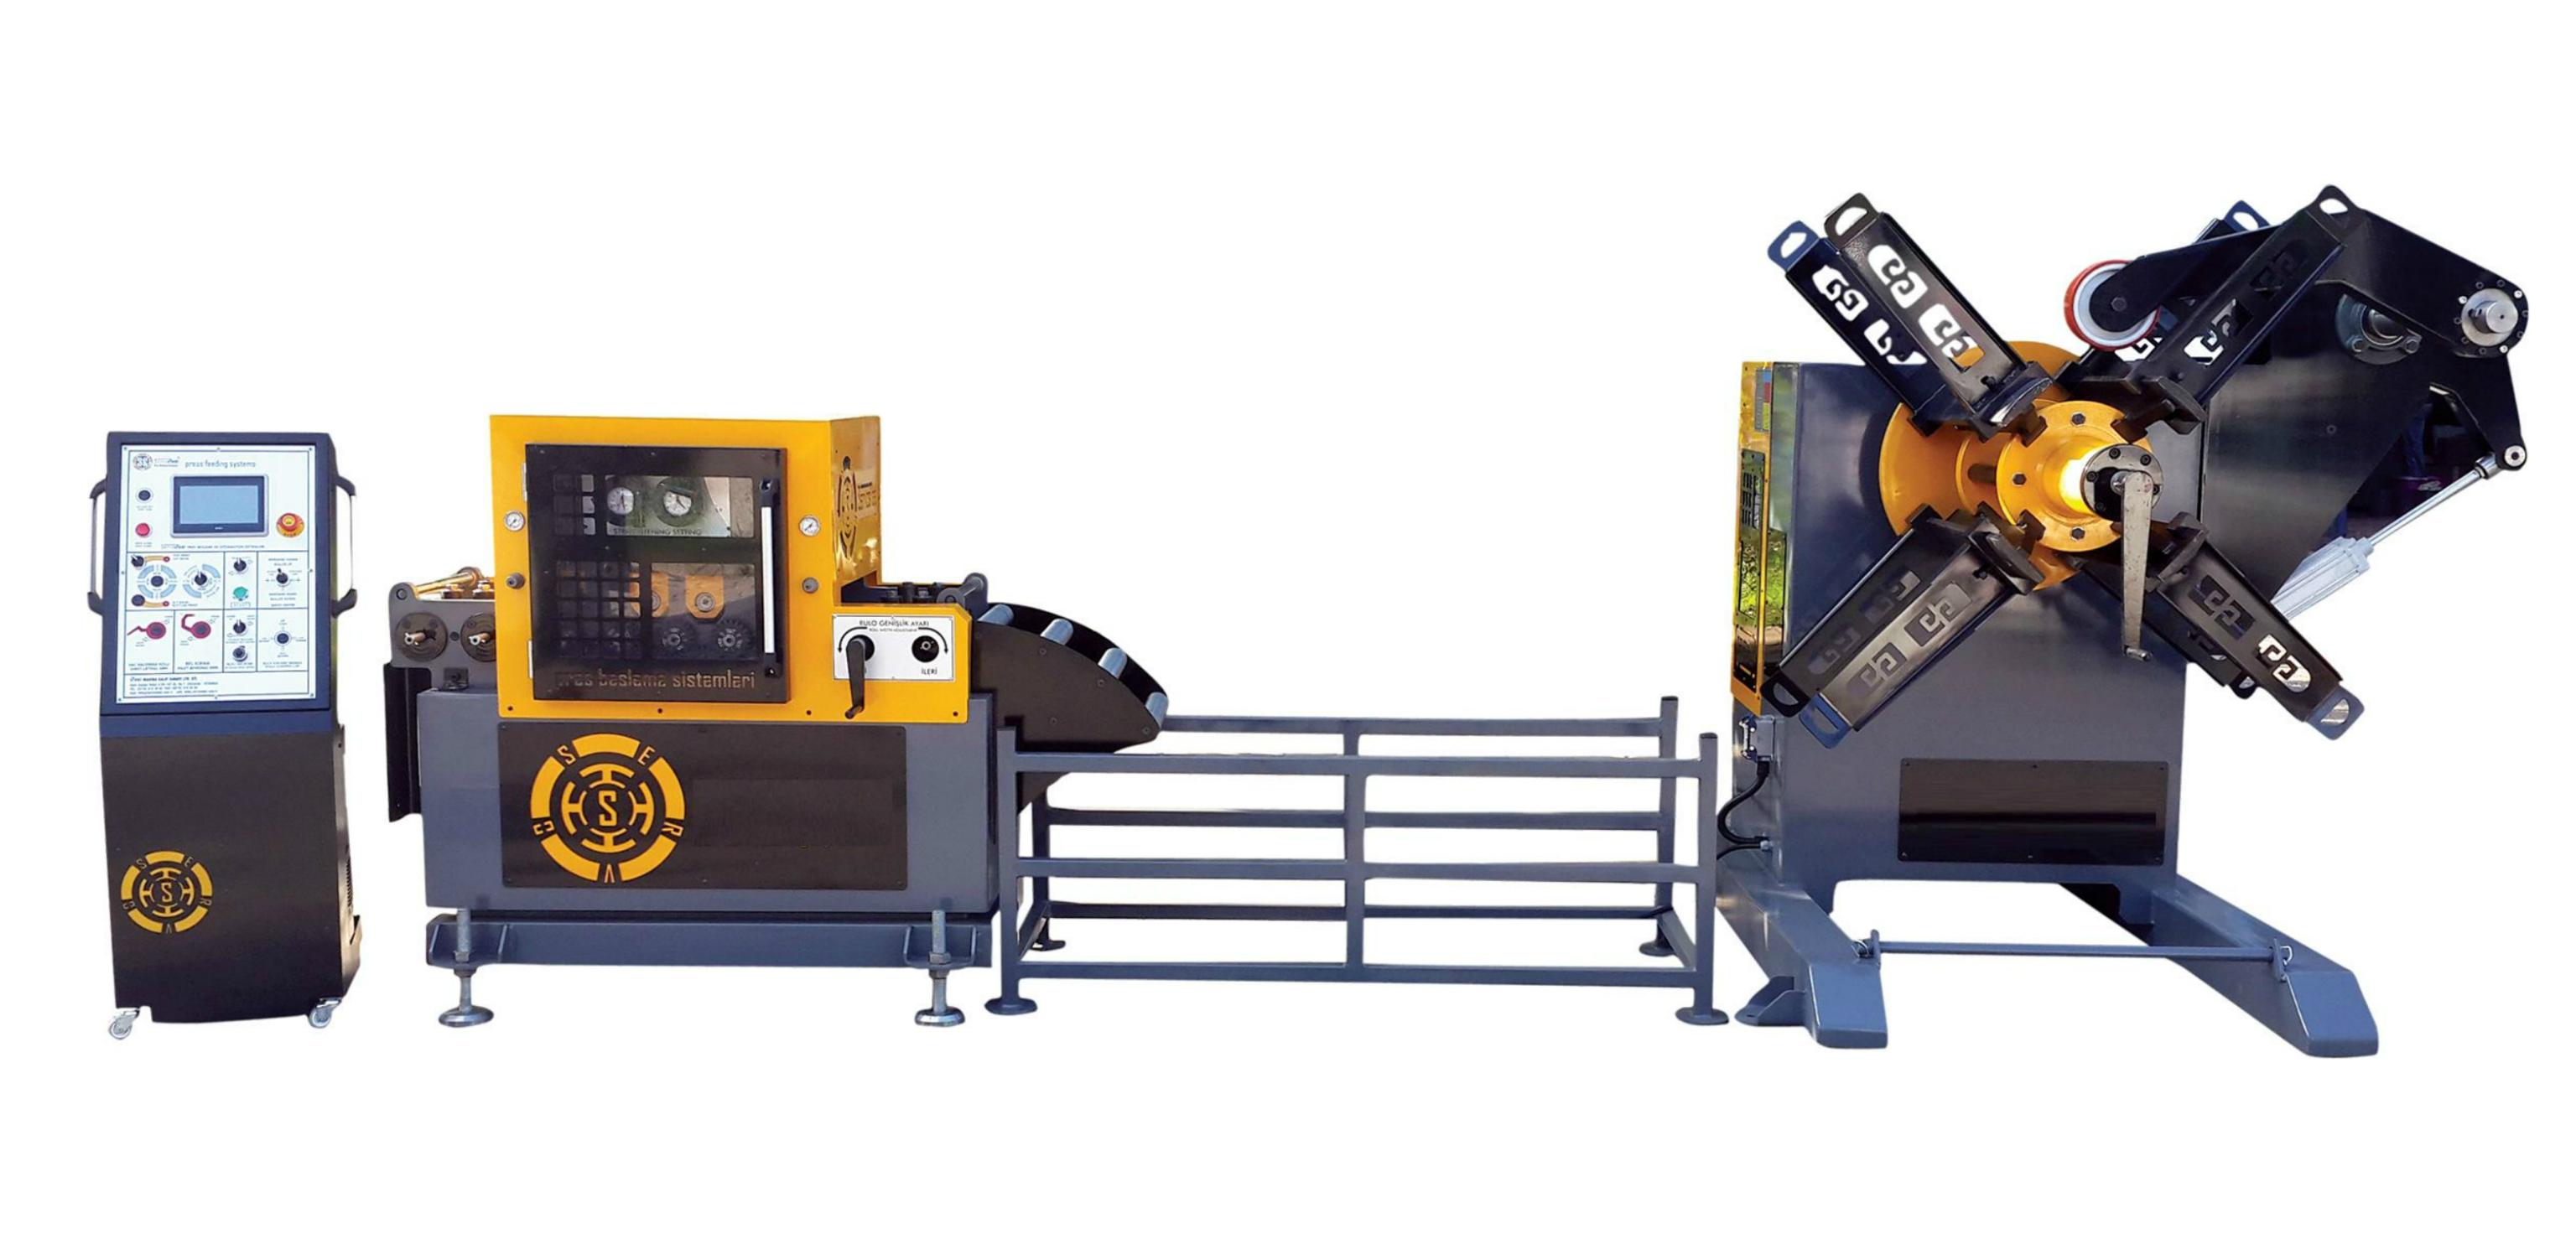 Hydraulic Decoiler supplier from Turkey turkish equipment press feeding system double decoiler motorized decoiler